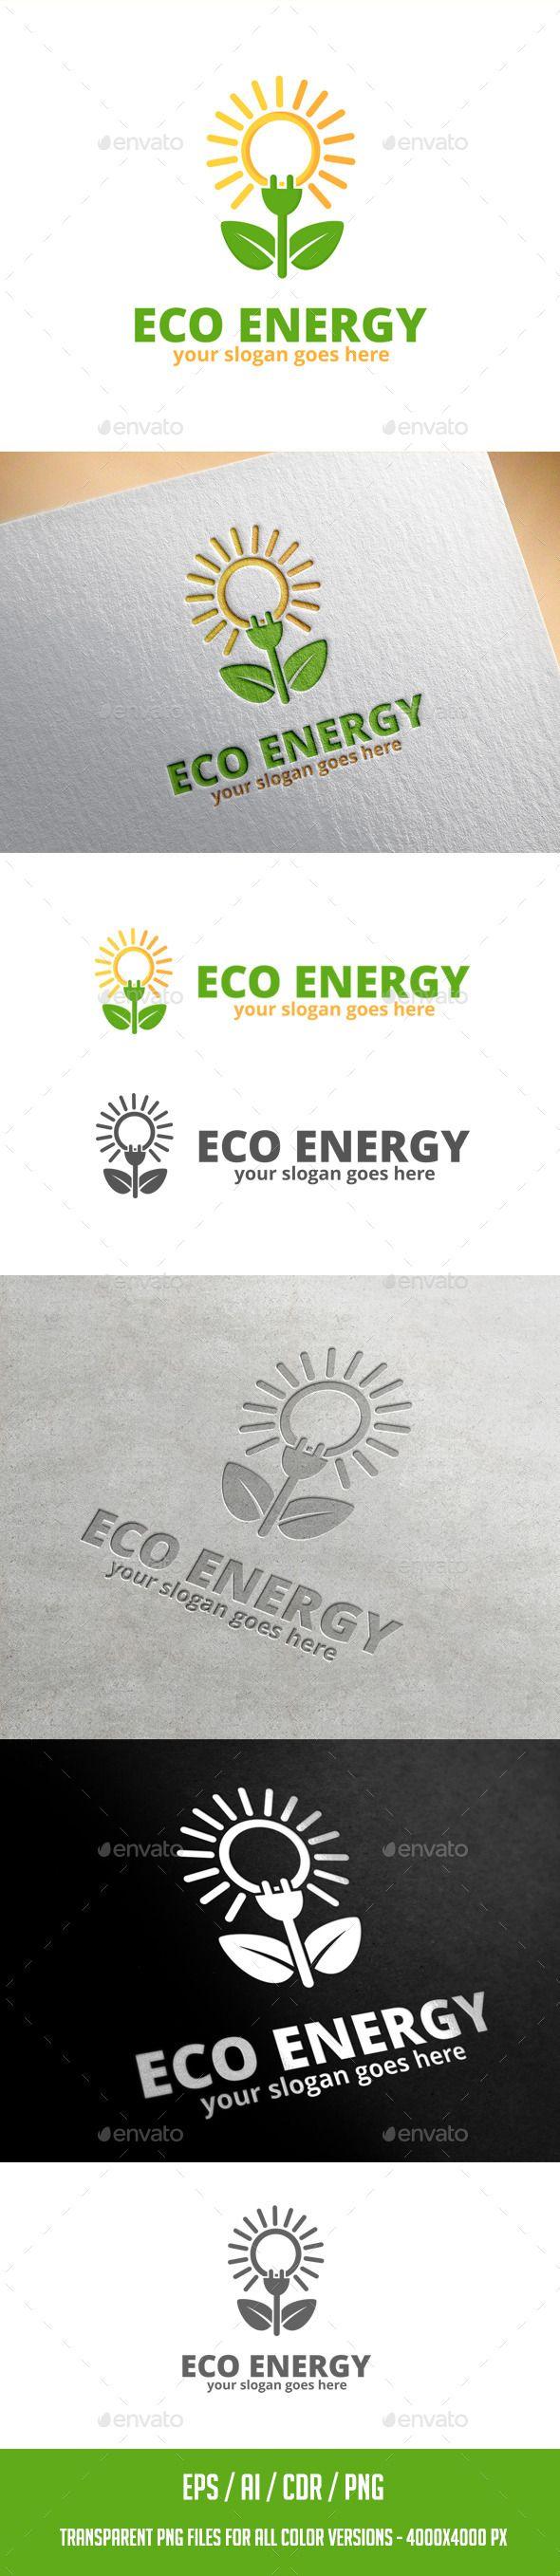 Eco Energy - Logo Design Template Vector #logotype Download it here: http://graphicriver.net/item/eco-energy-logo-template-/11656329?s_rank=762?ref=nesto